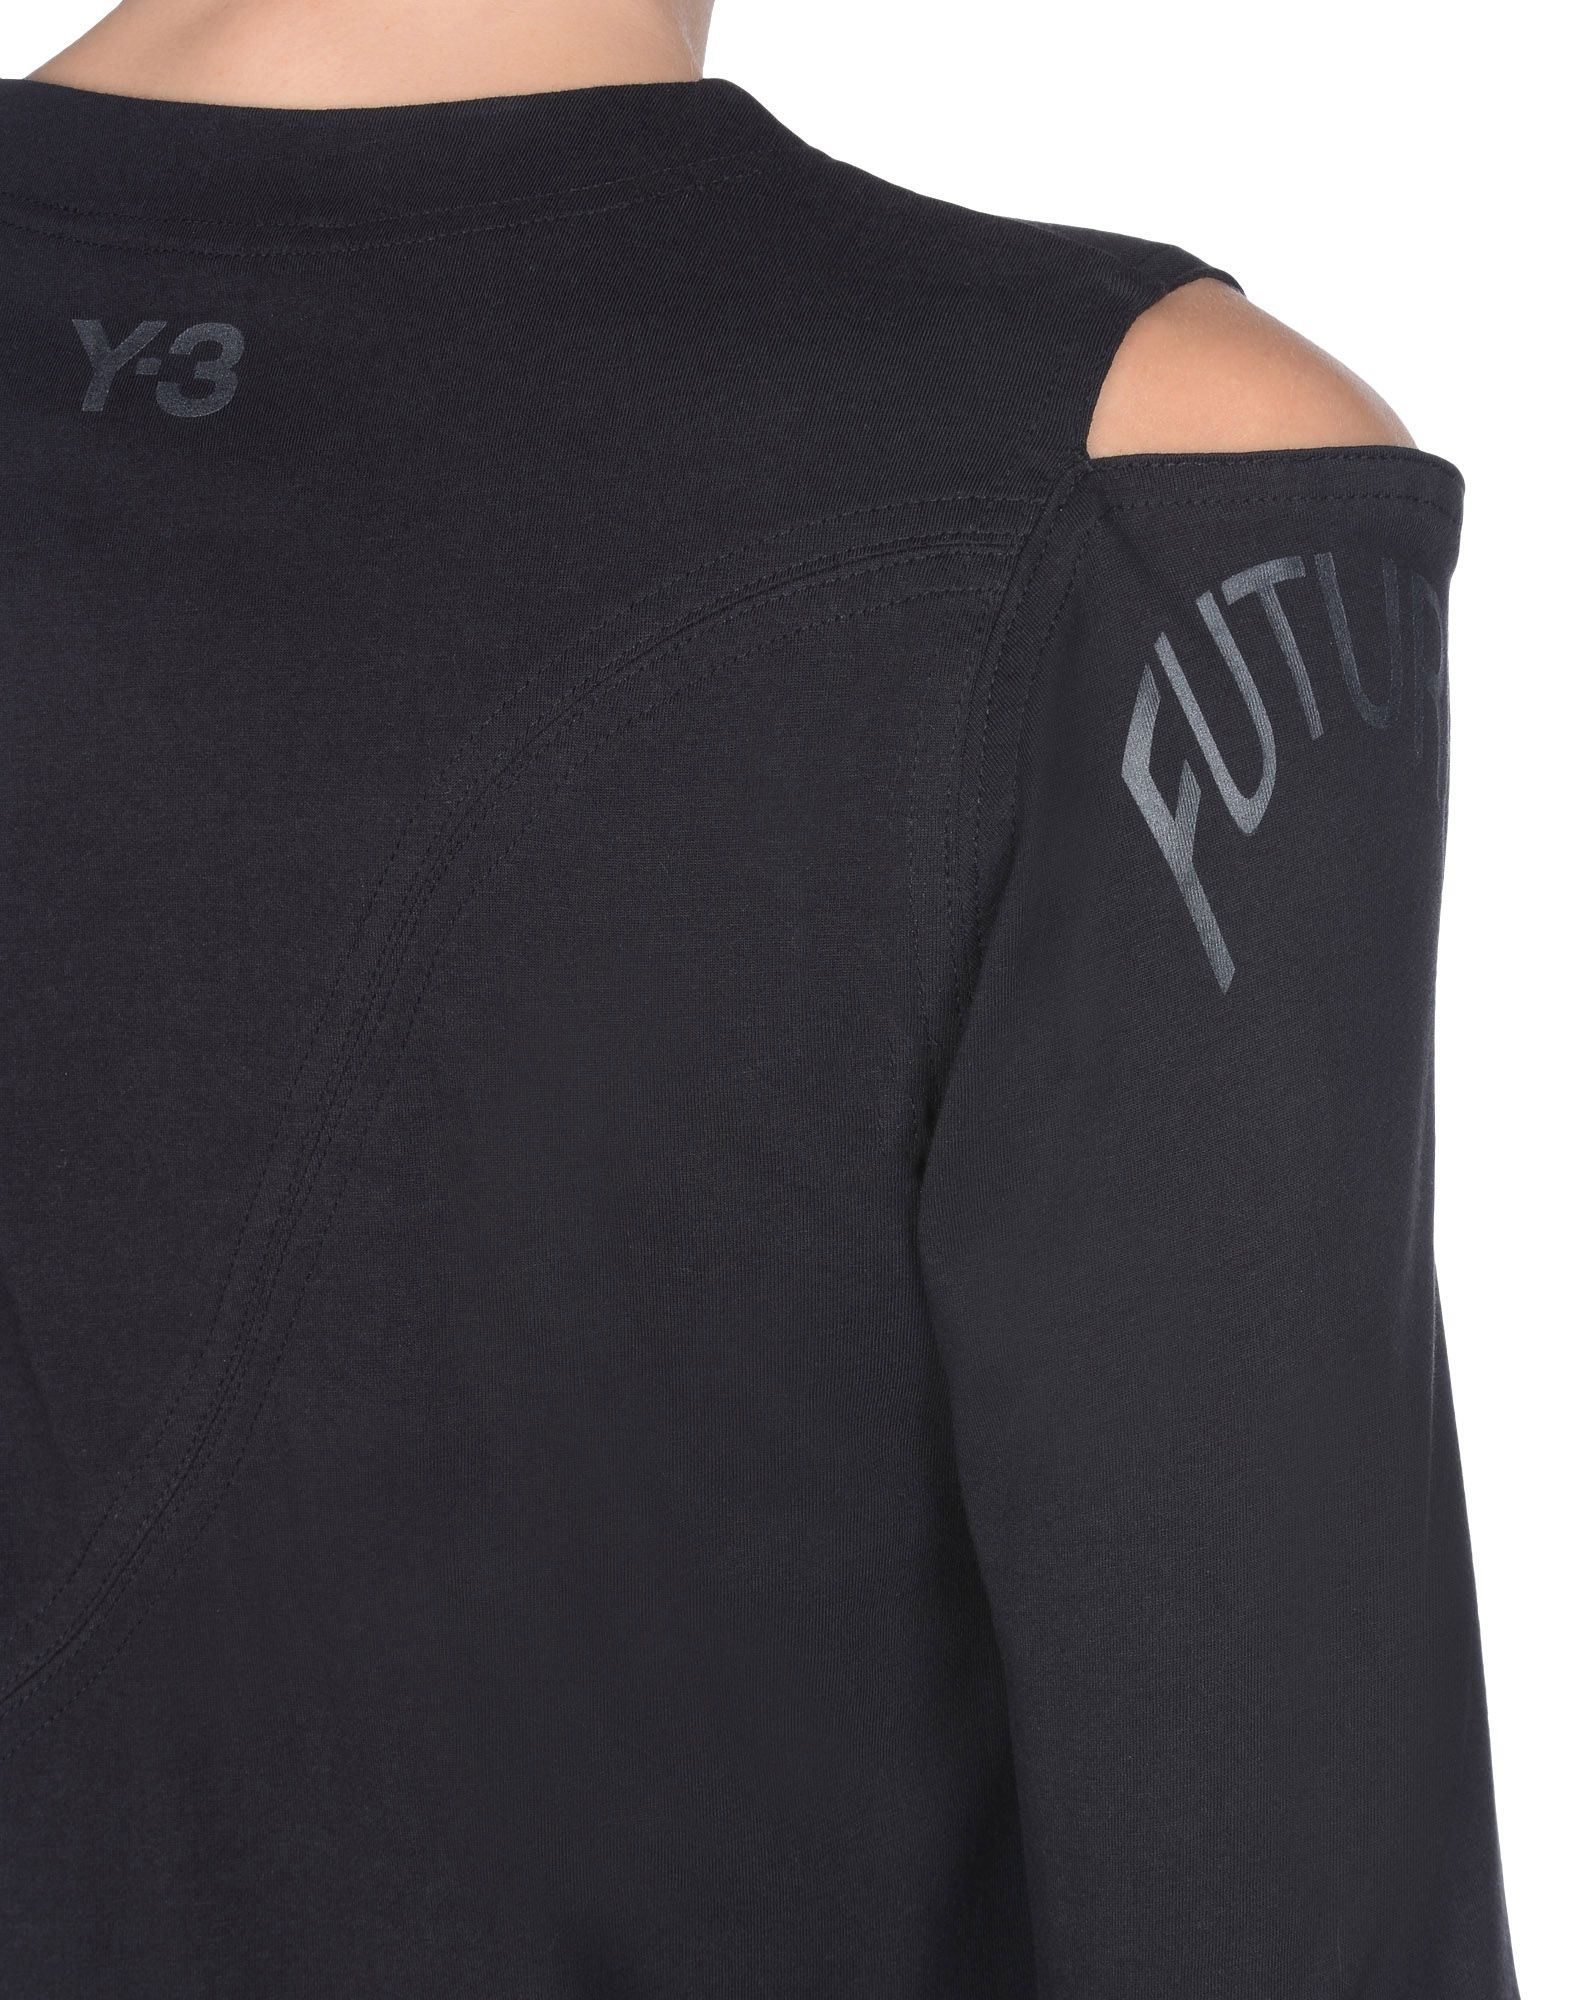 Y-3 STATEMENT DRESS DRESSES & SKIRTS woman Y-3 adidas